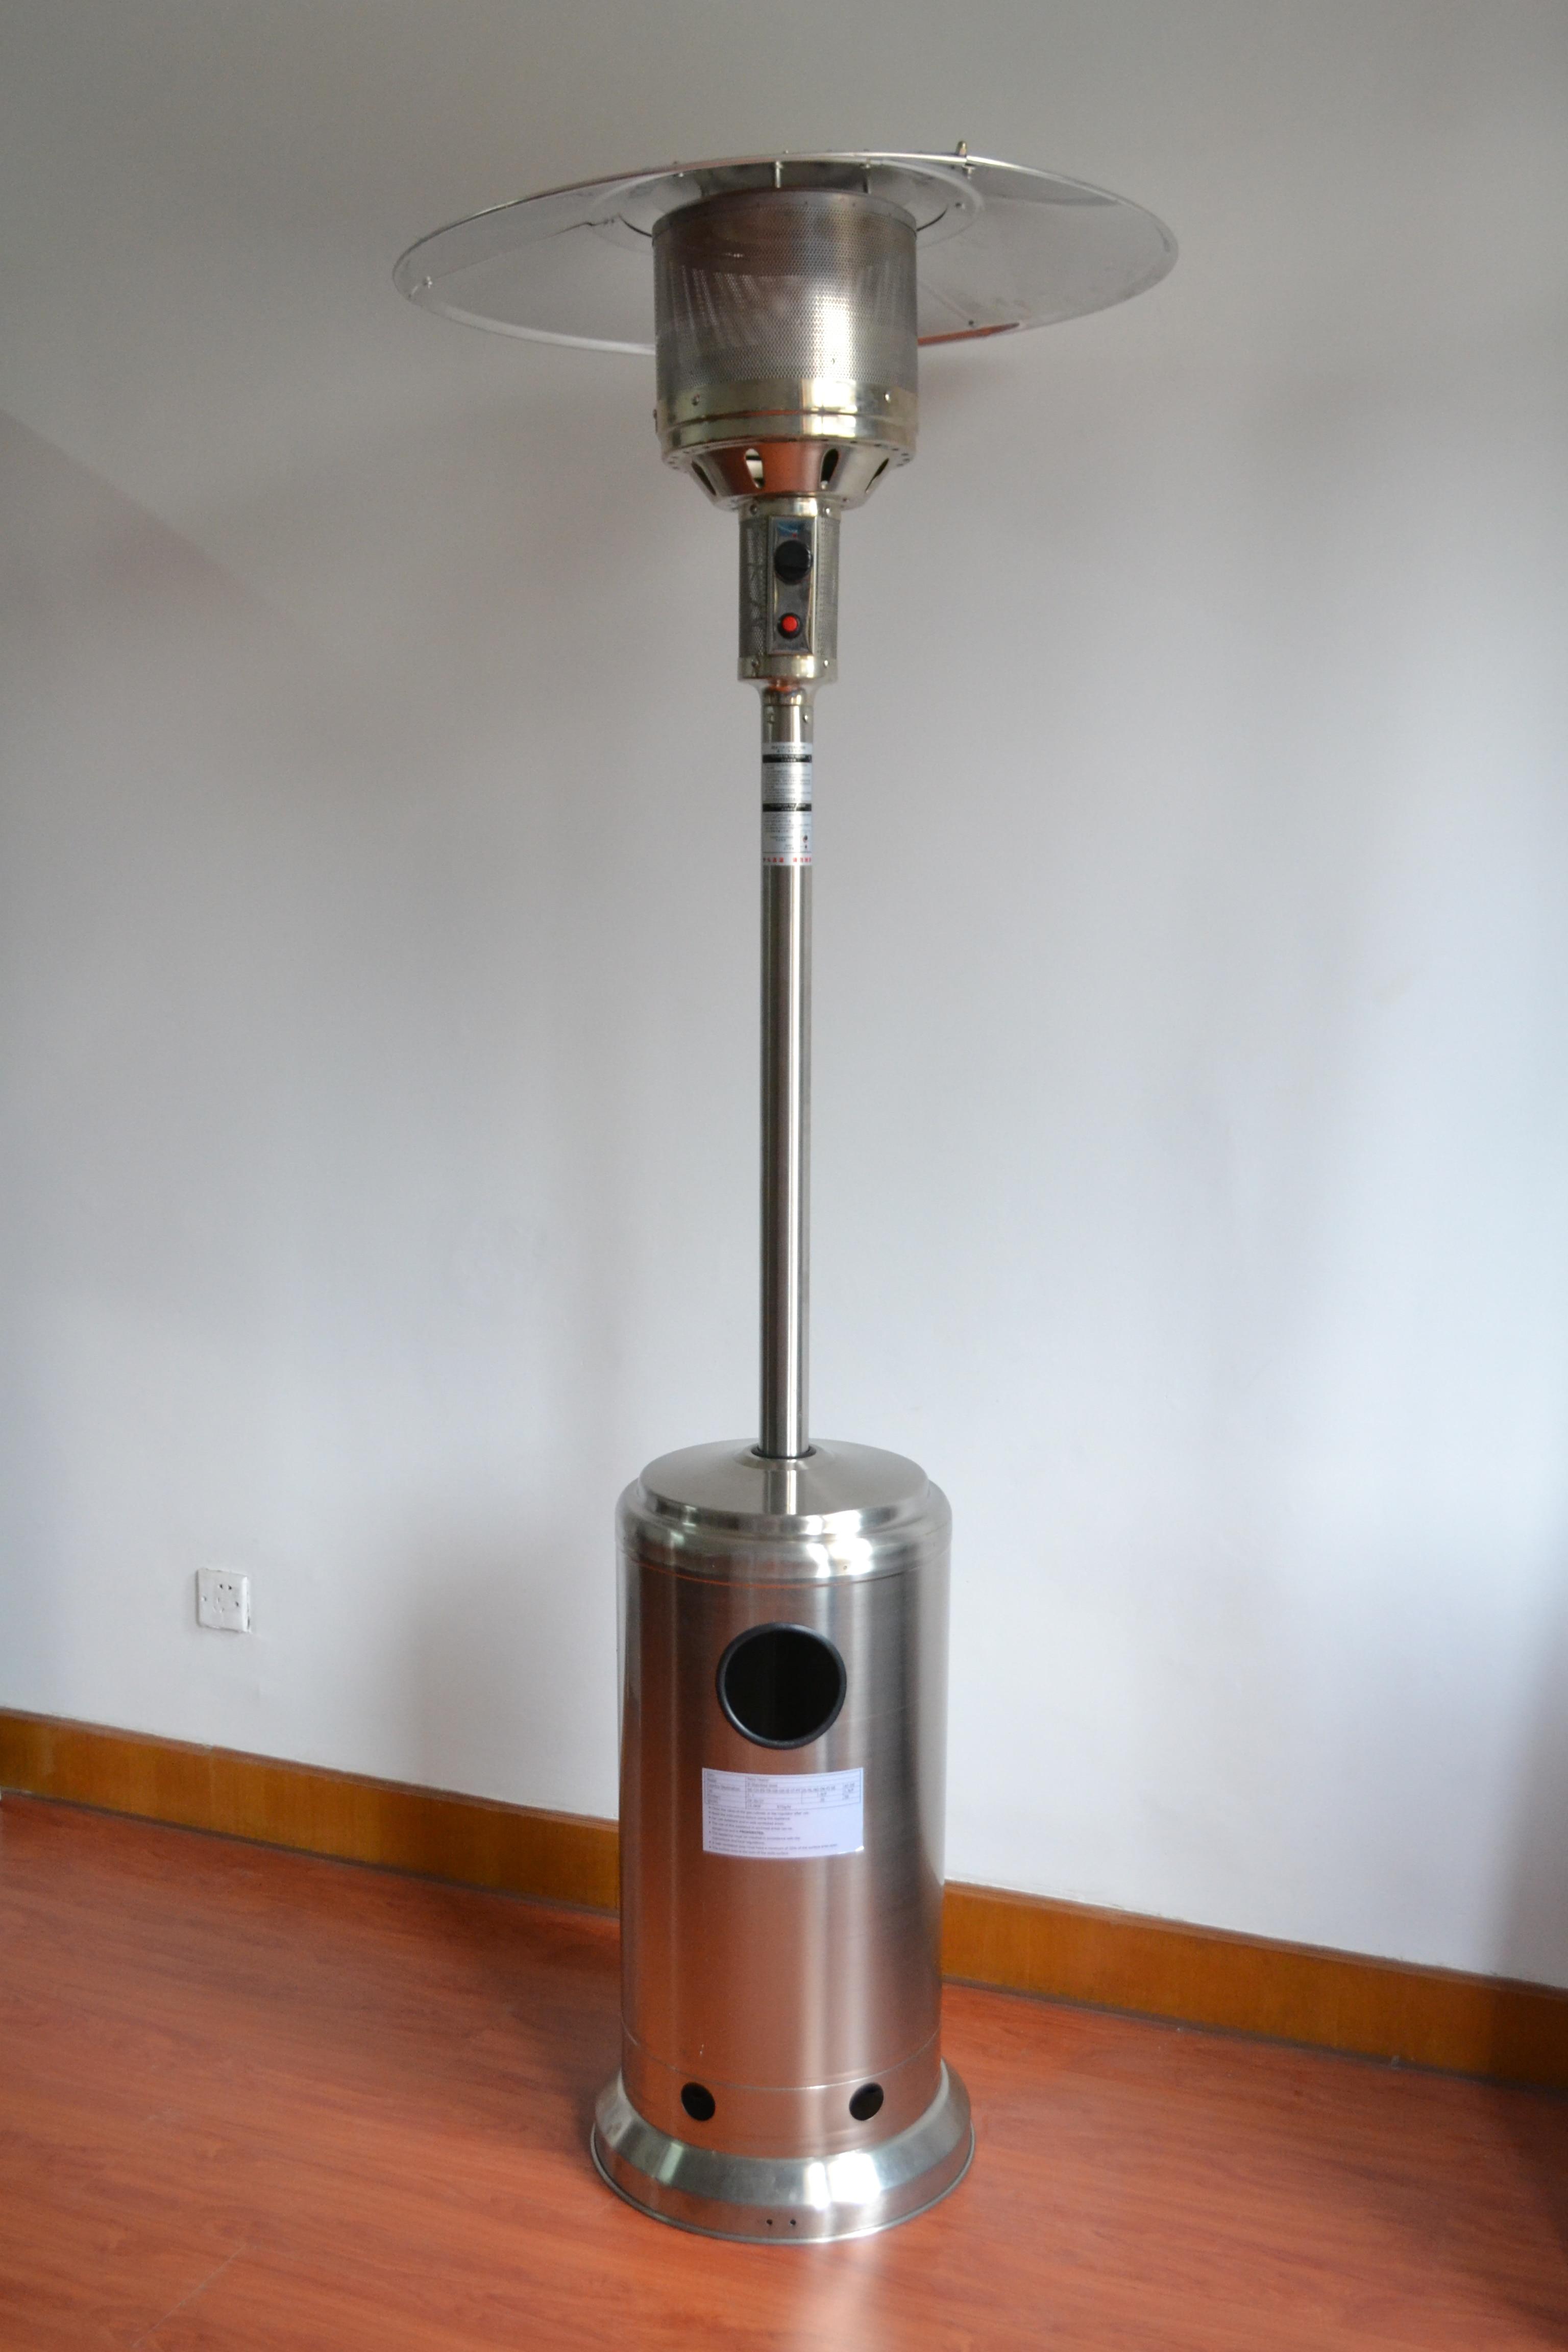 Stainless Steel Heater Gas Heater Outdoor Gas Heater Patio Heater Patio Heaters Aliexpress